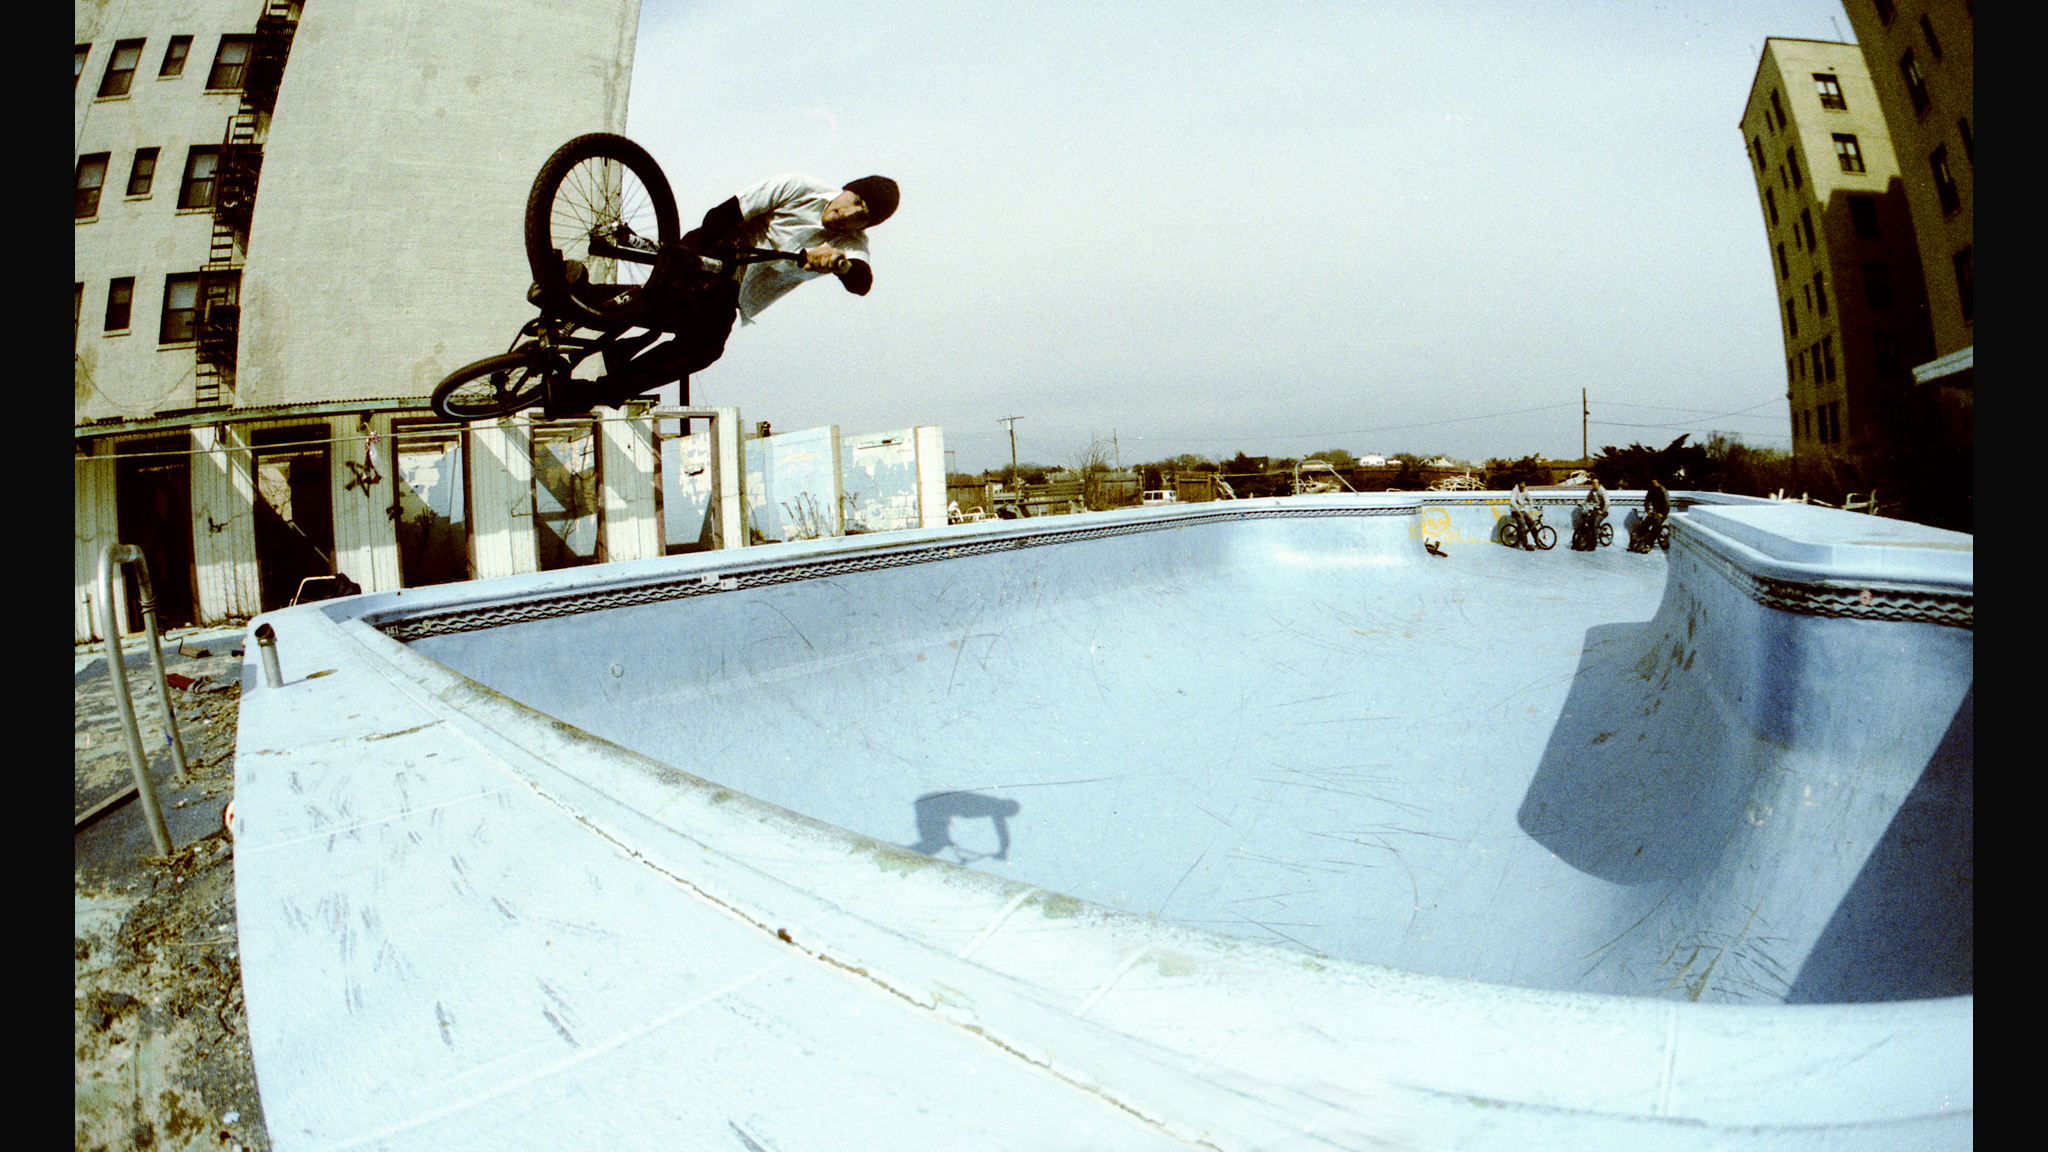 Garrett Byrnes, Asbury Park, N.J.